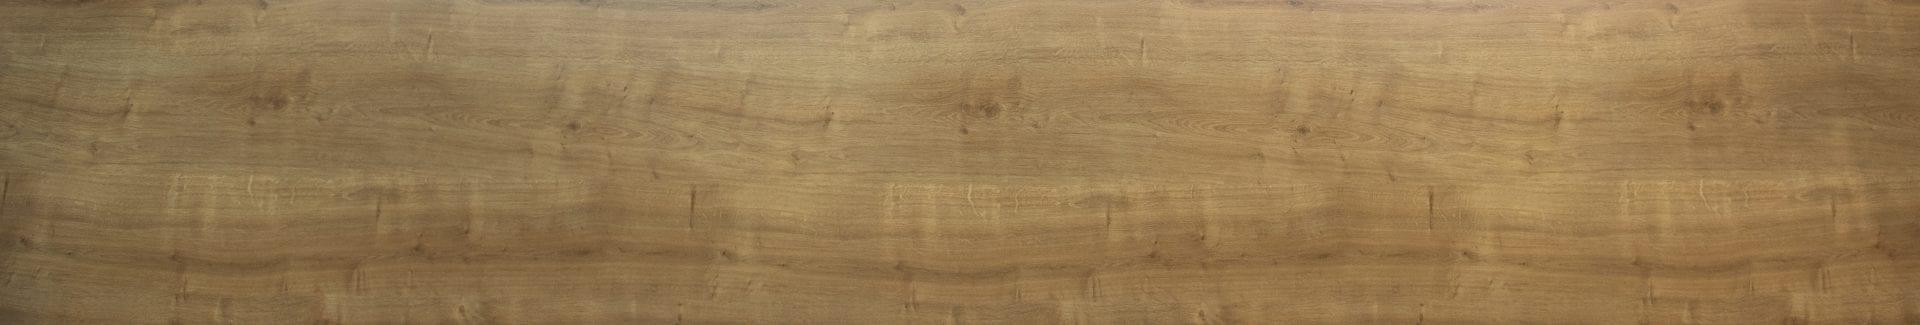 Highland Oak Full Length Laminate Worktop by Topform